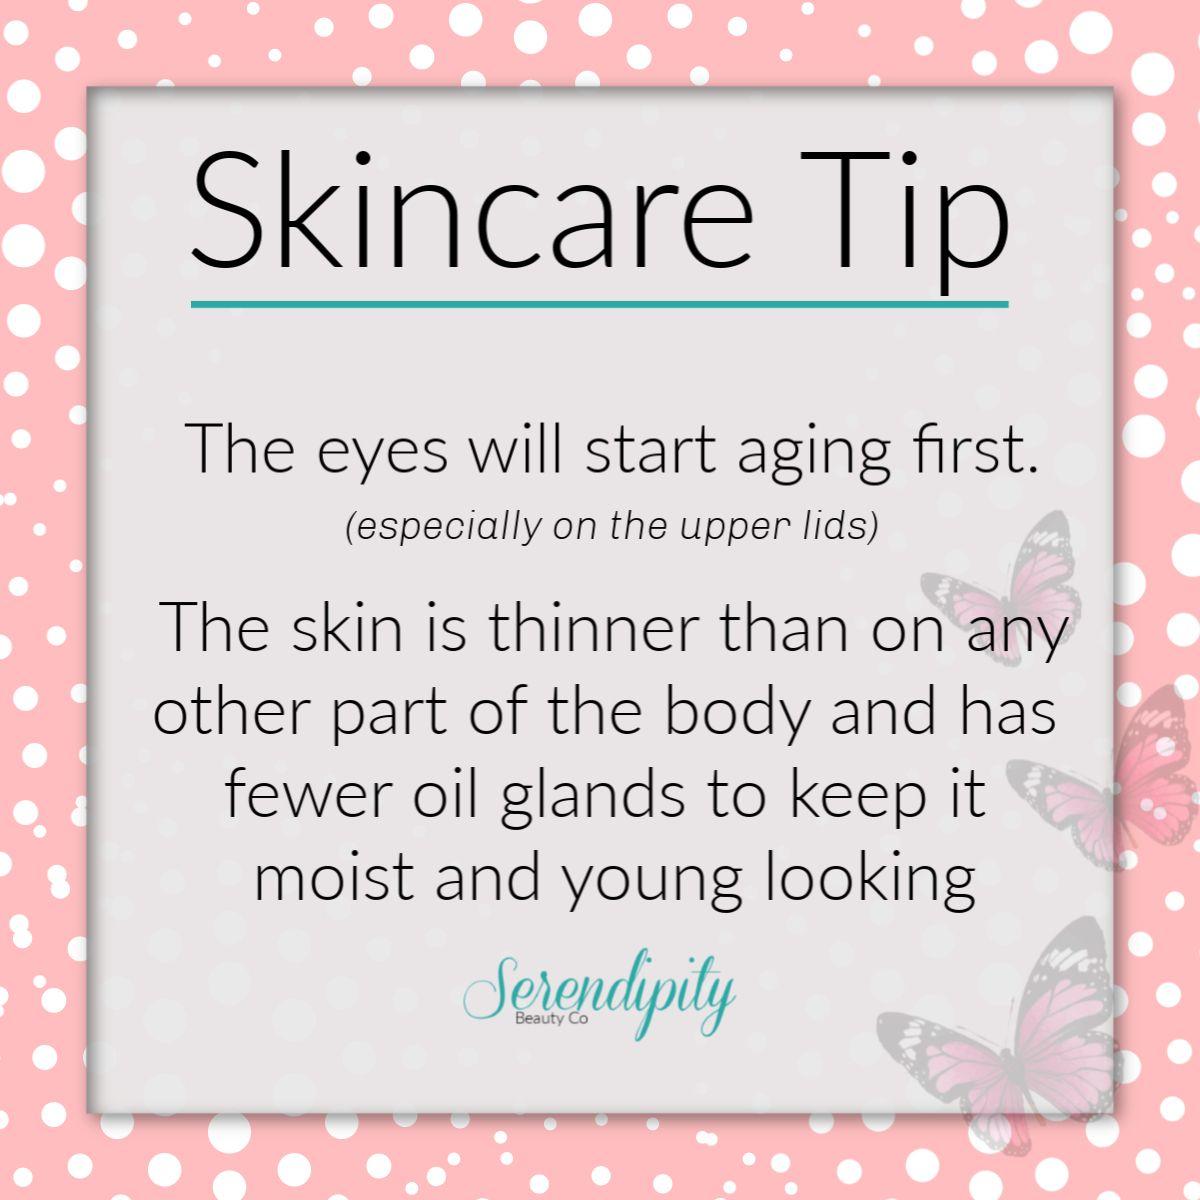 Skincare Tip  Skincare facts, Skin facts, Skin care